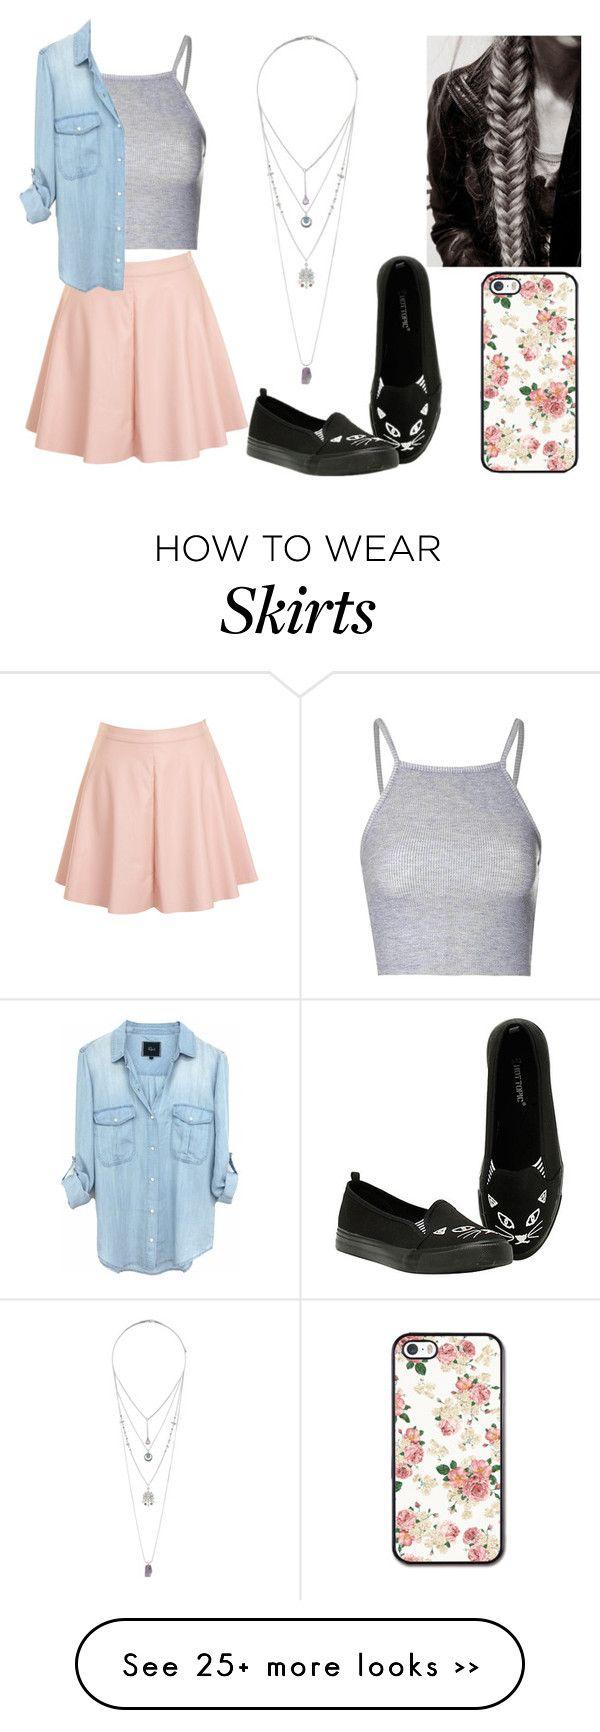 """Peach Skater Skirt"" by larrytattos on Polyvore"